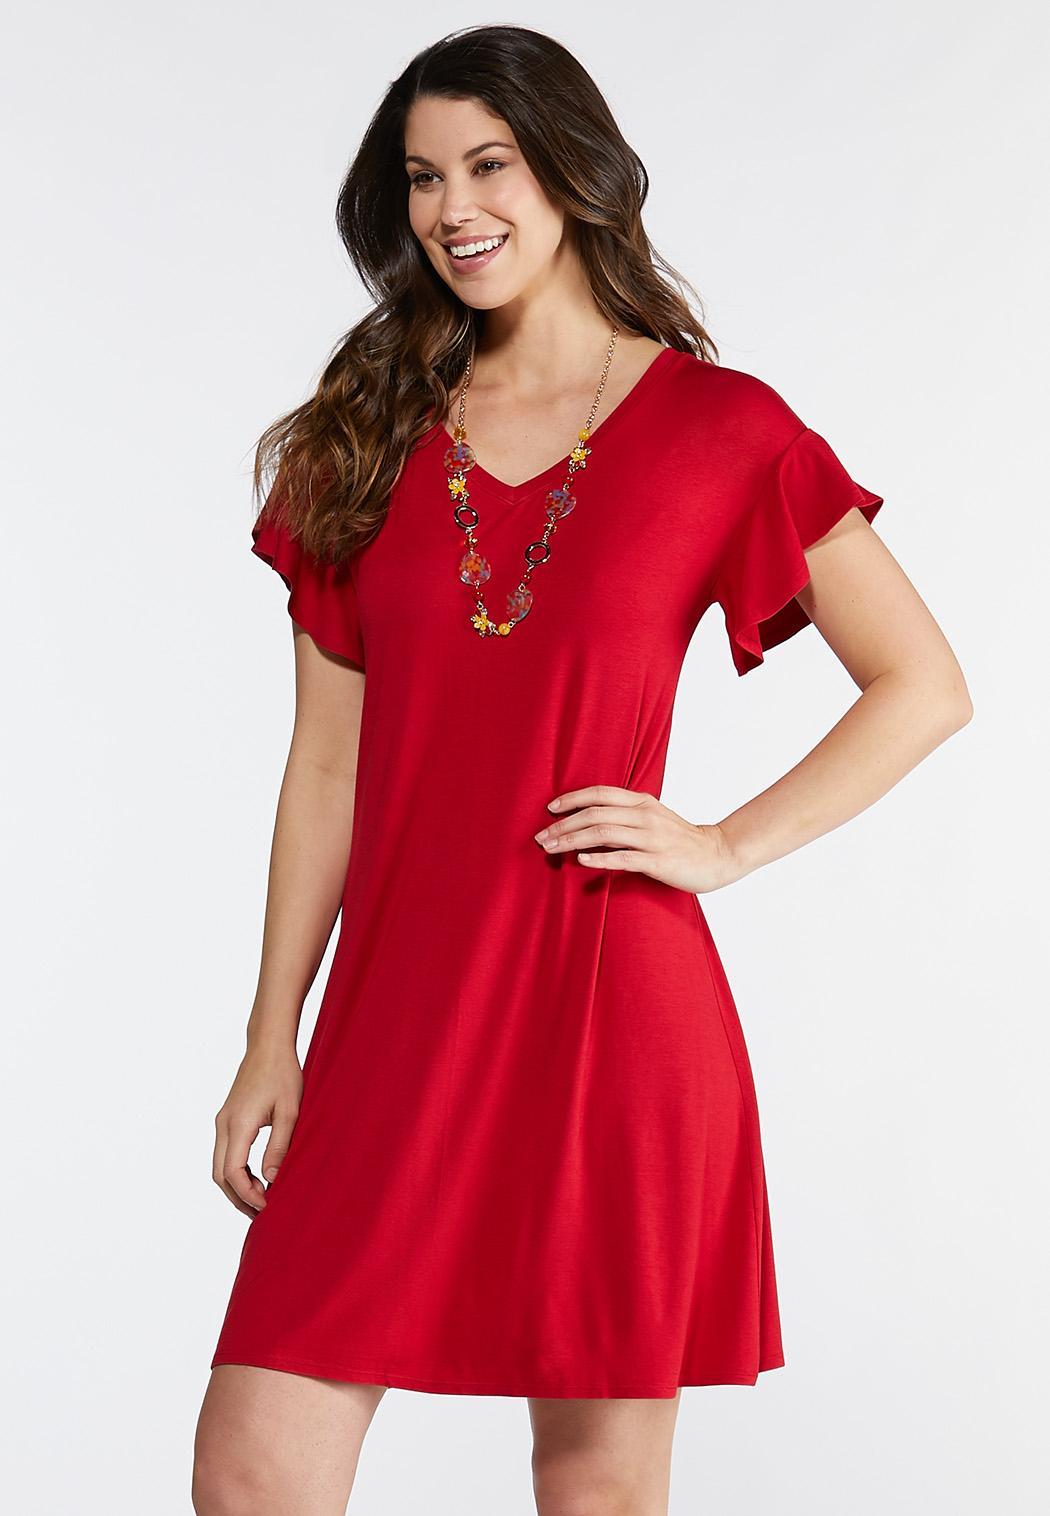 Plus Size Red T-Shirt Dress Dresses Cato Fashions